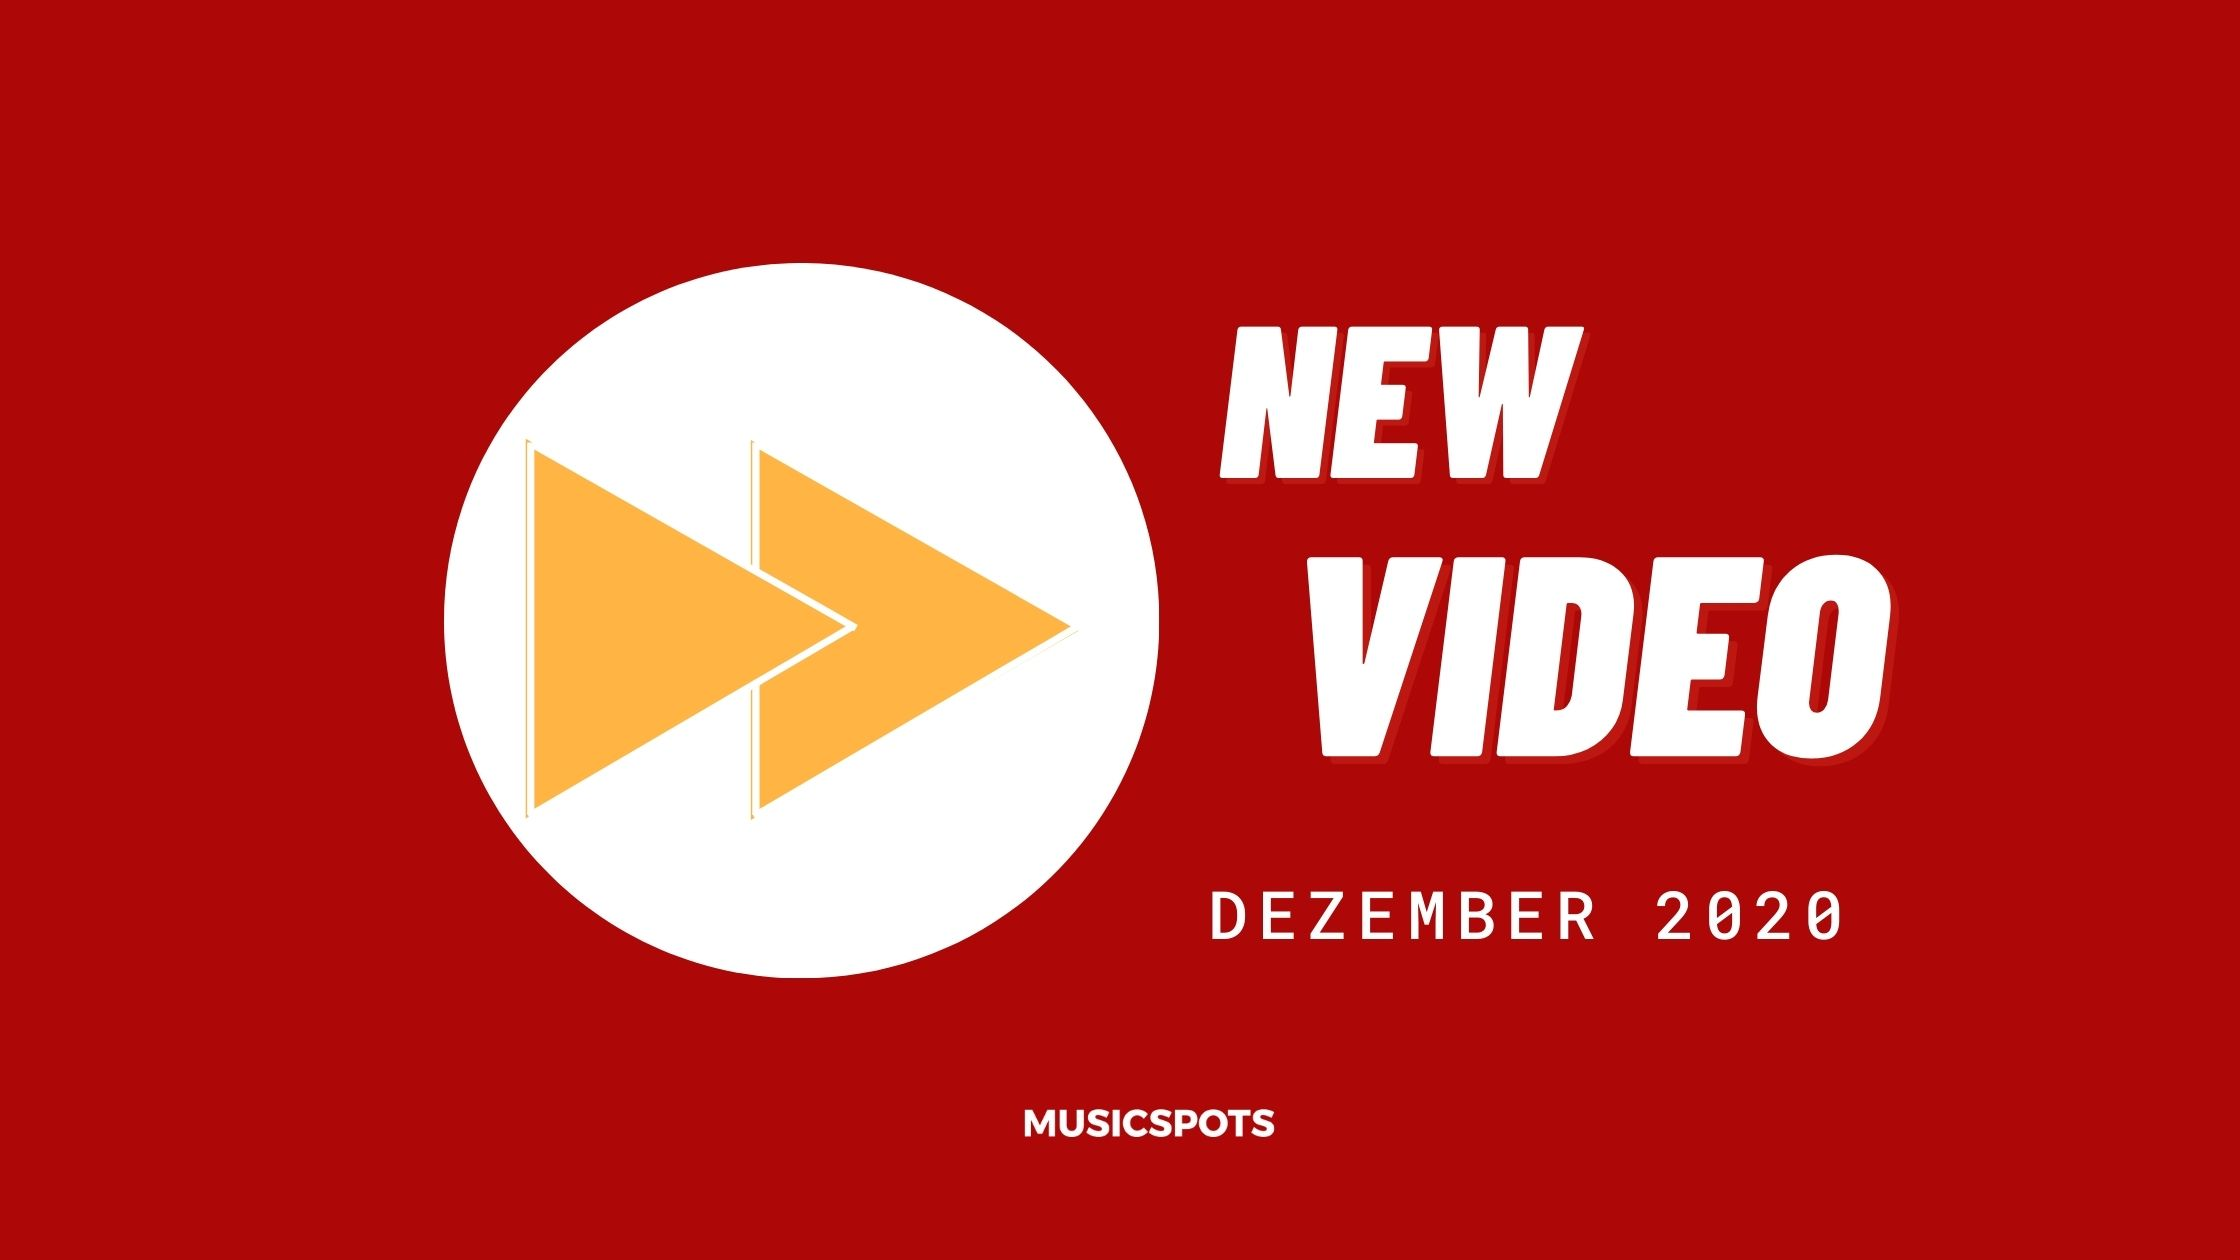 Videos_Dezember_2020